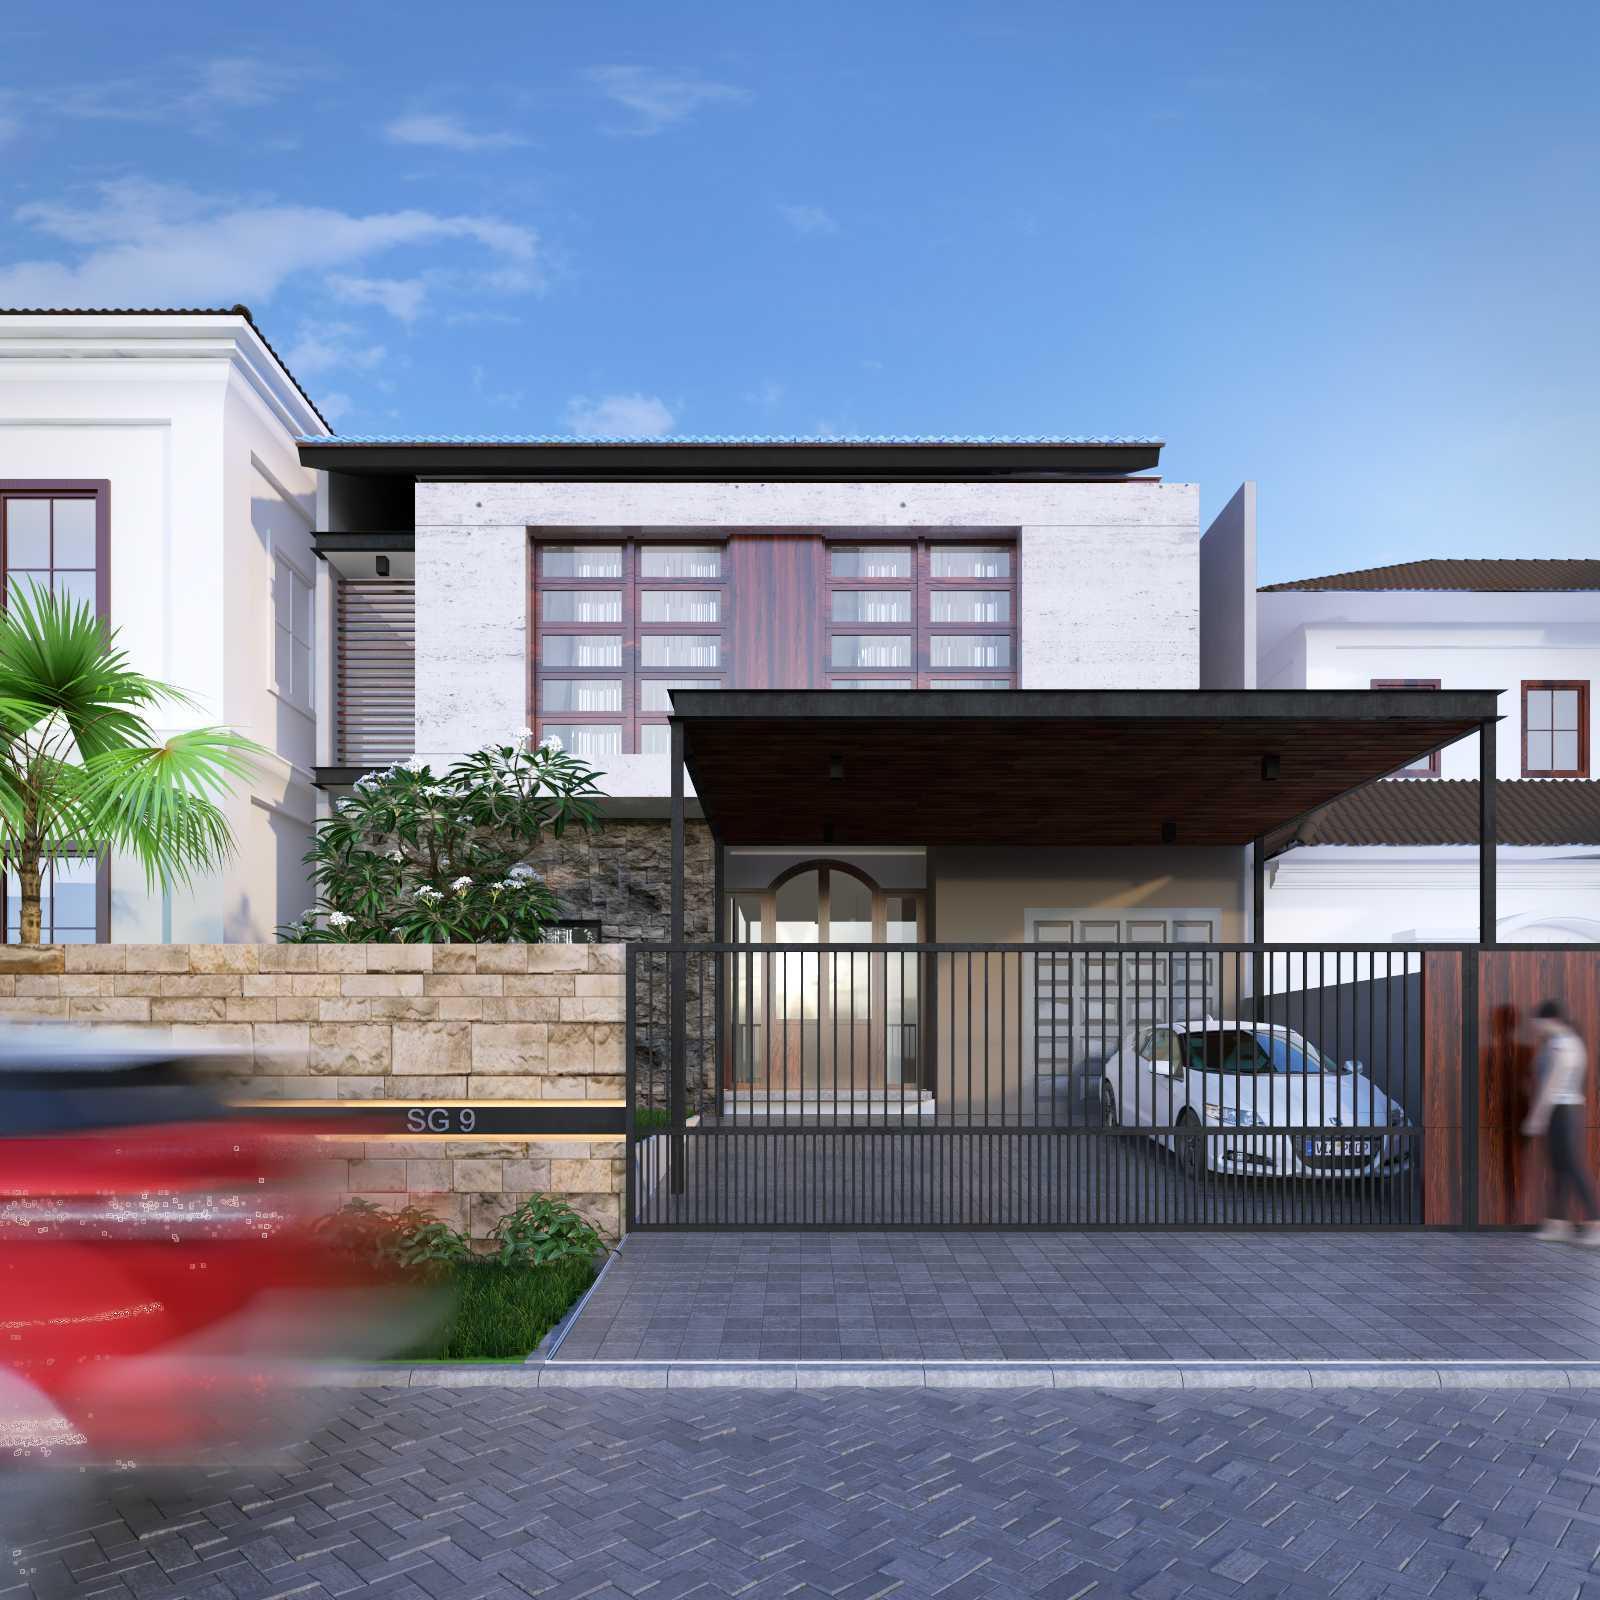 Studio Rtm Rumah Pondok Indah  Pondok Indah, Jakarta, Indonesia Pondok Indah, Jakarta, Indonesia Nico-Alt-13 Modern,tropis  28744